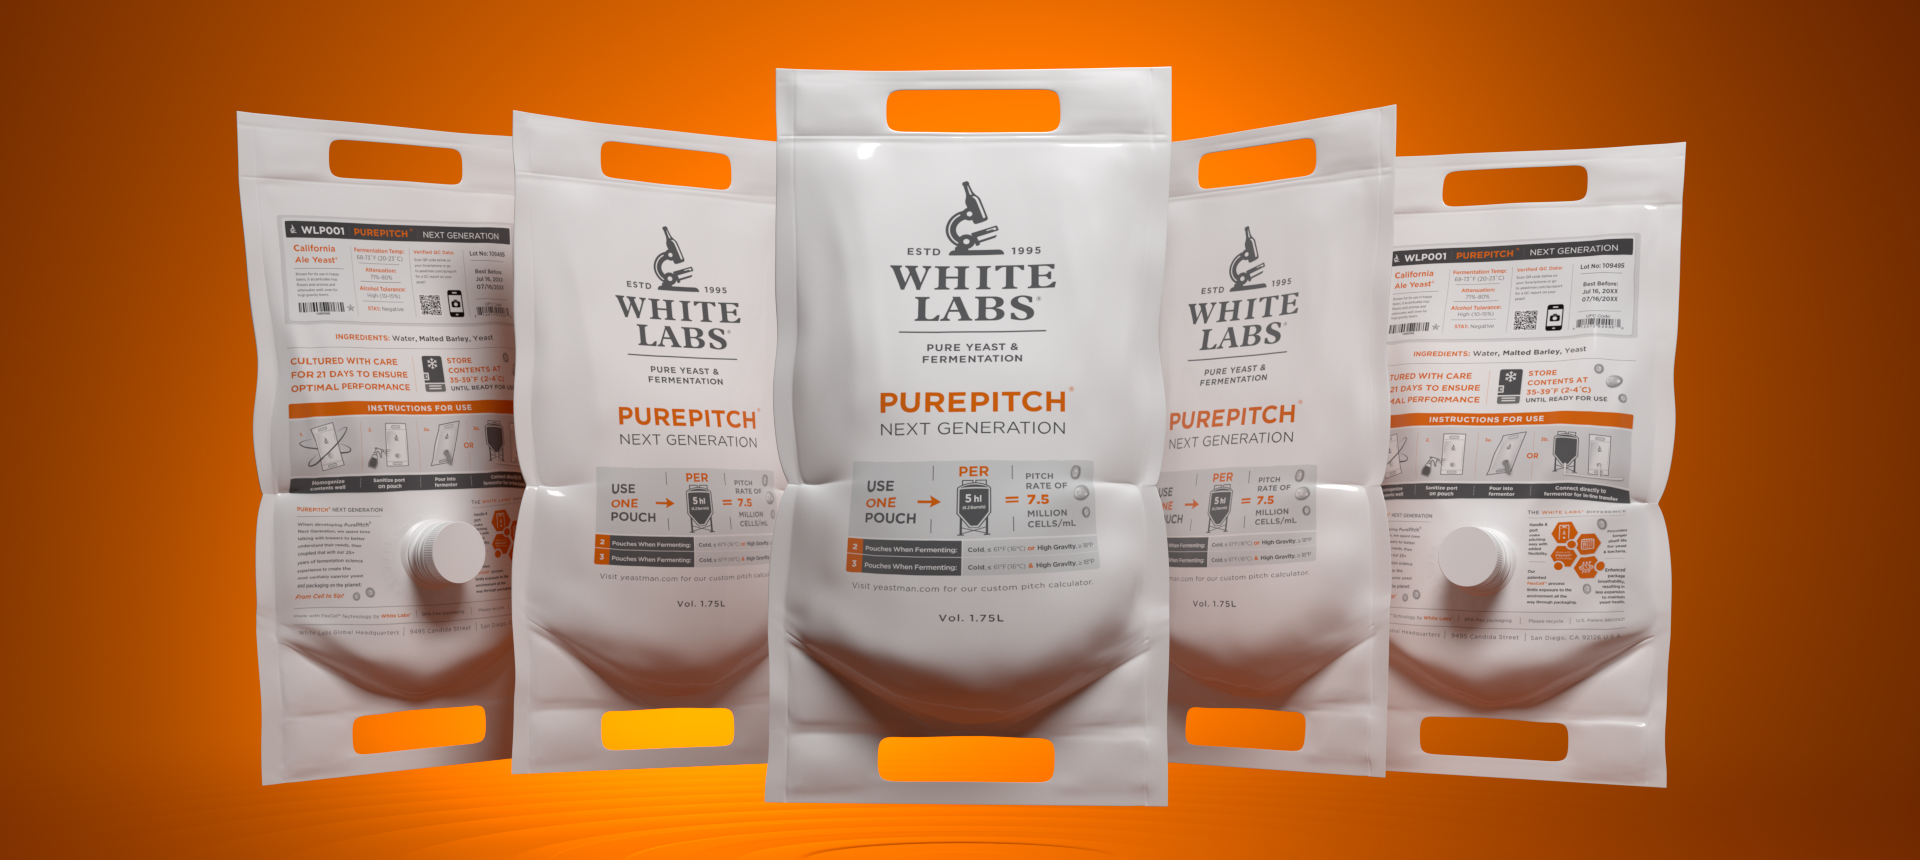 PurePitch Next Generation